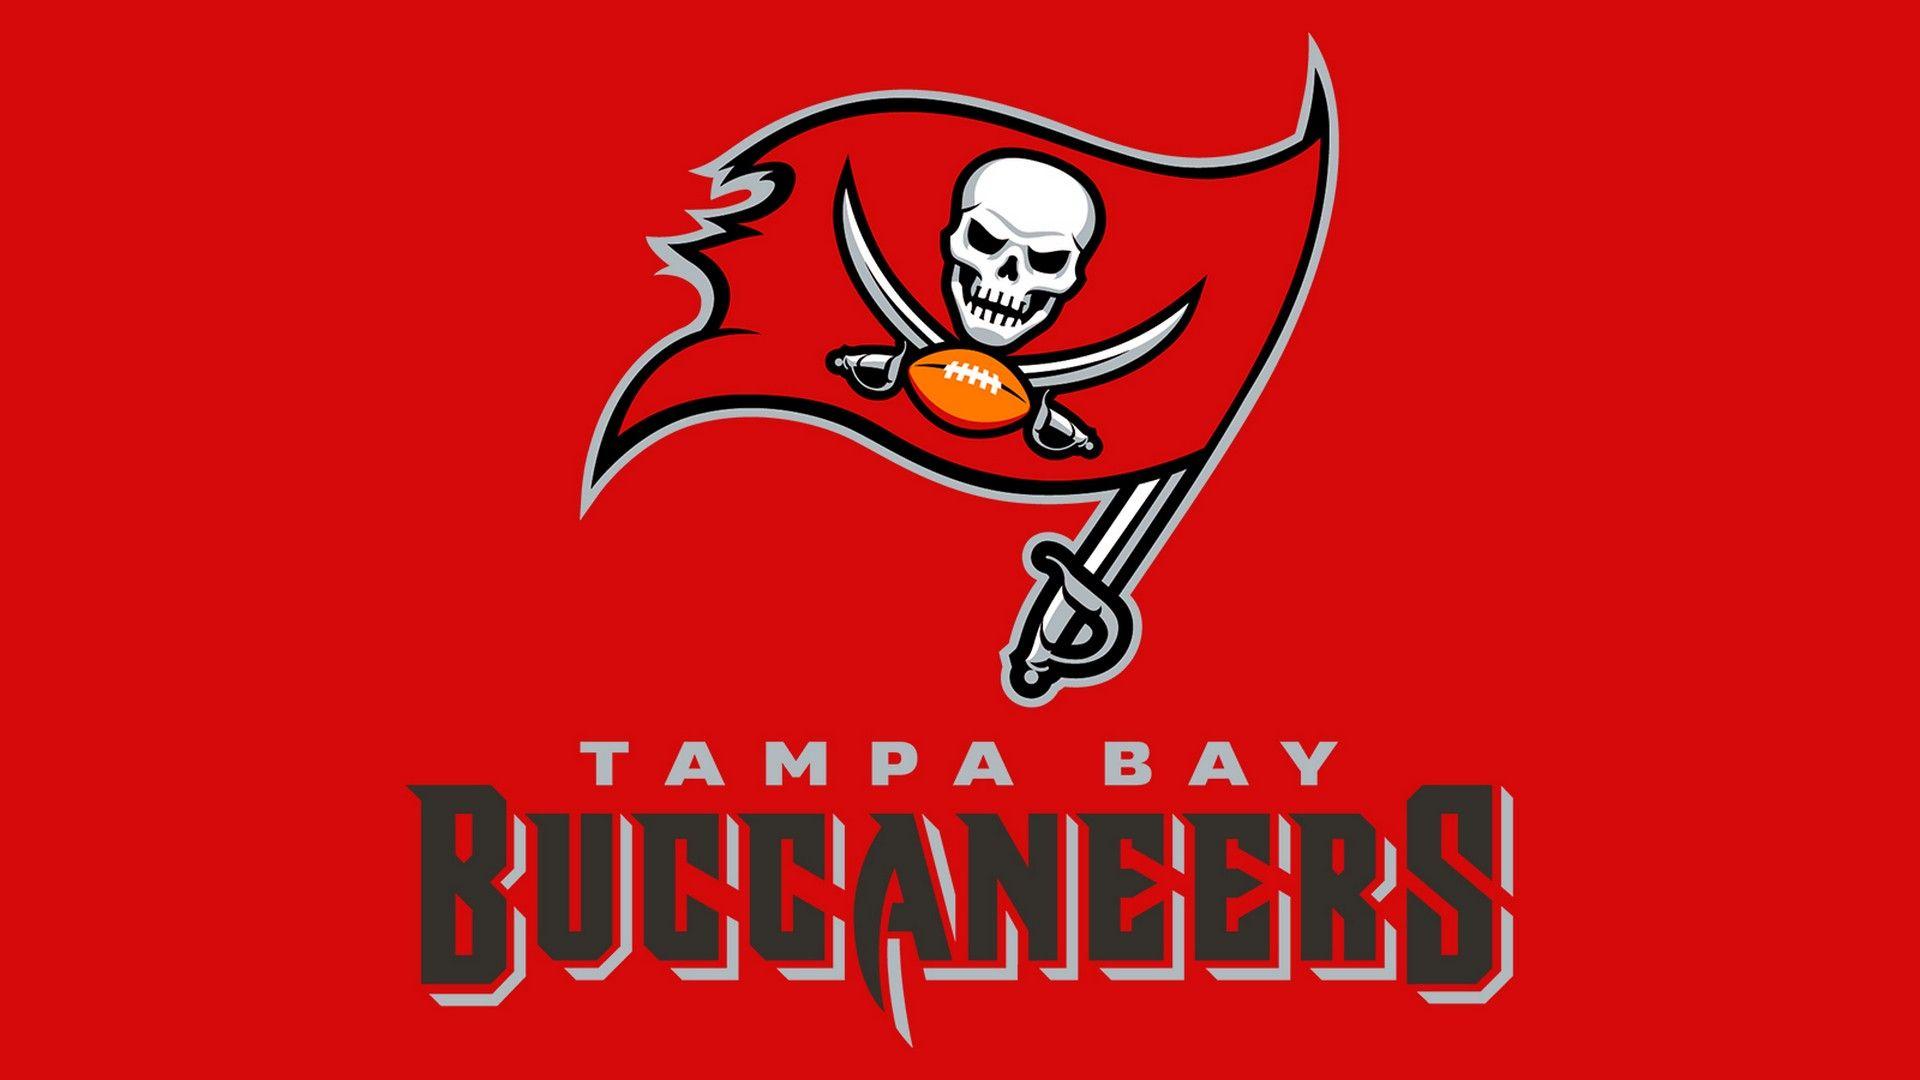 Wallpapers Hd Tampa Bay Buccaneers 2020 Nfl Football Wallpapers Tampa Bay Buccaneers Nfl Football Wallpaper Tampa Bay